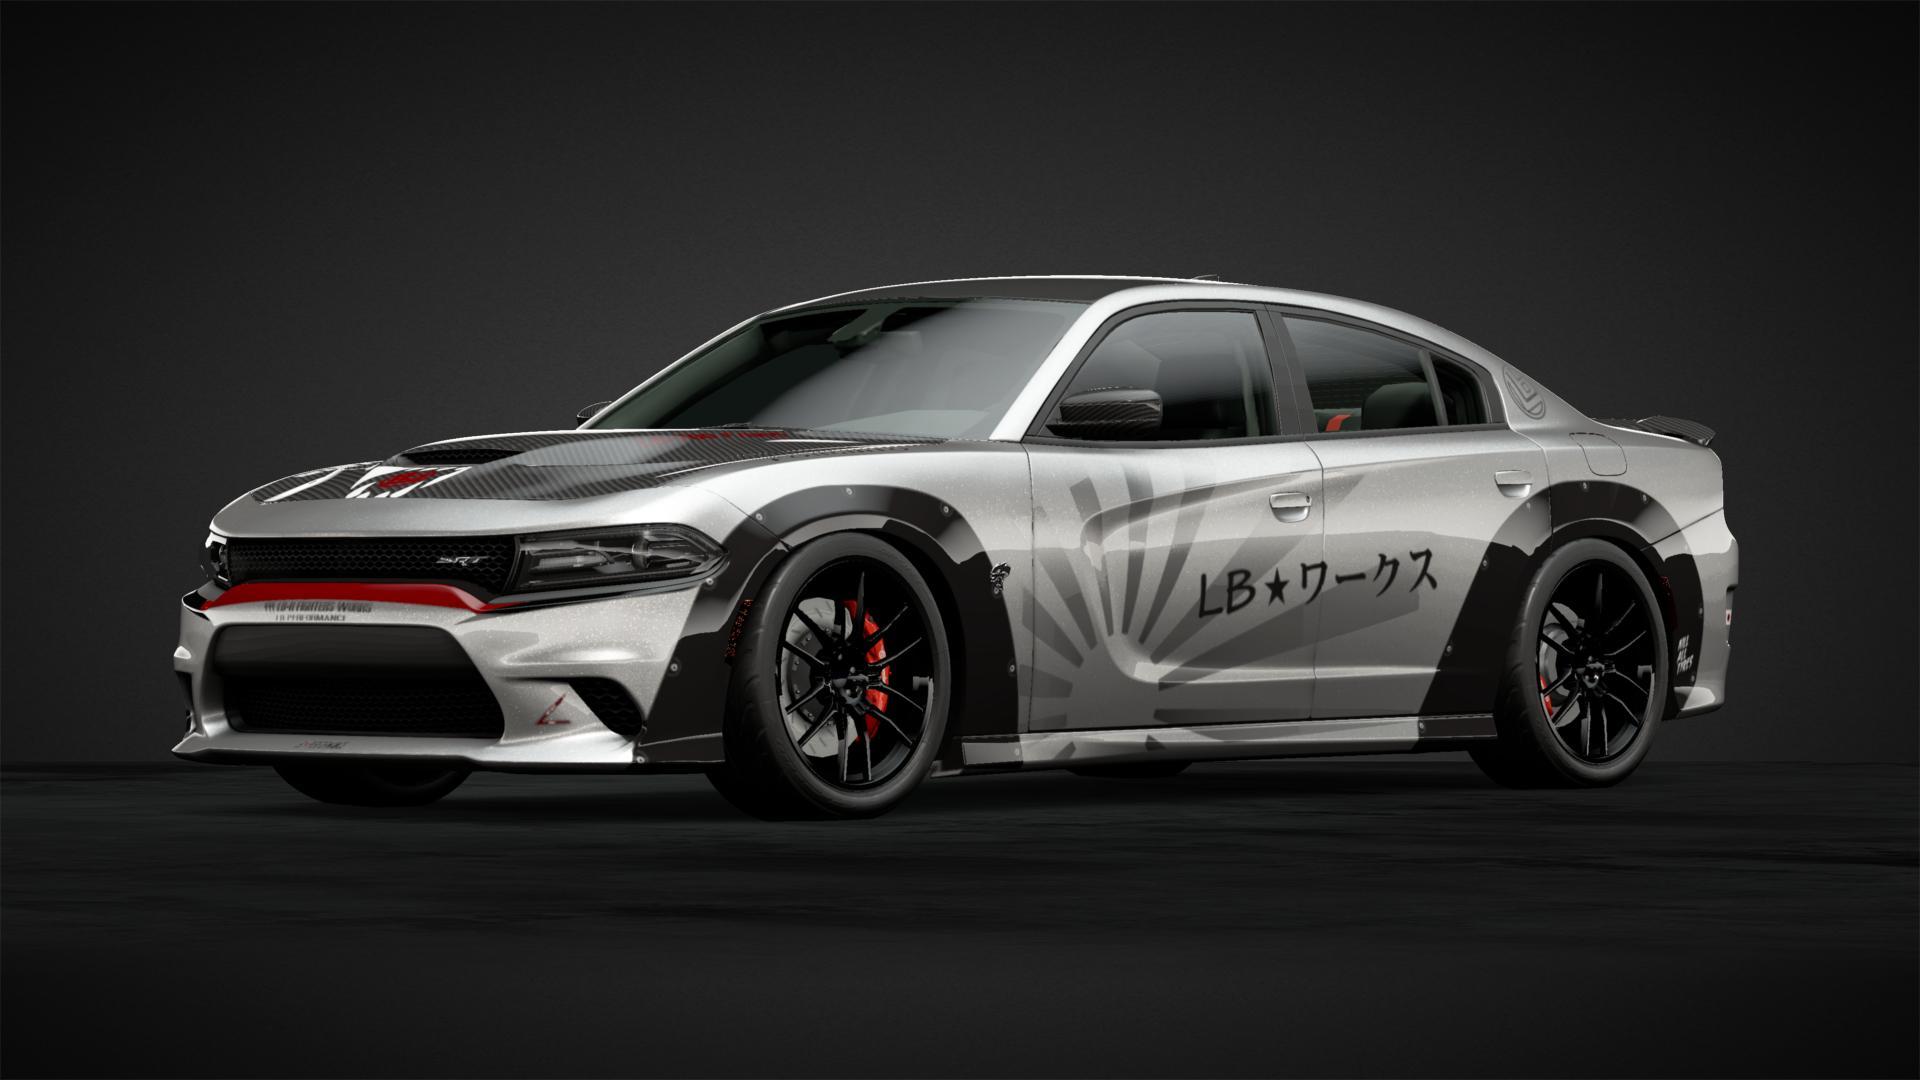 Liberty Walk Hellcat Car Livery By Cam Ber Gang23 Community Gran Turismo Sport